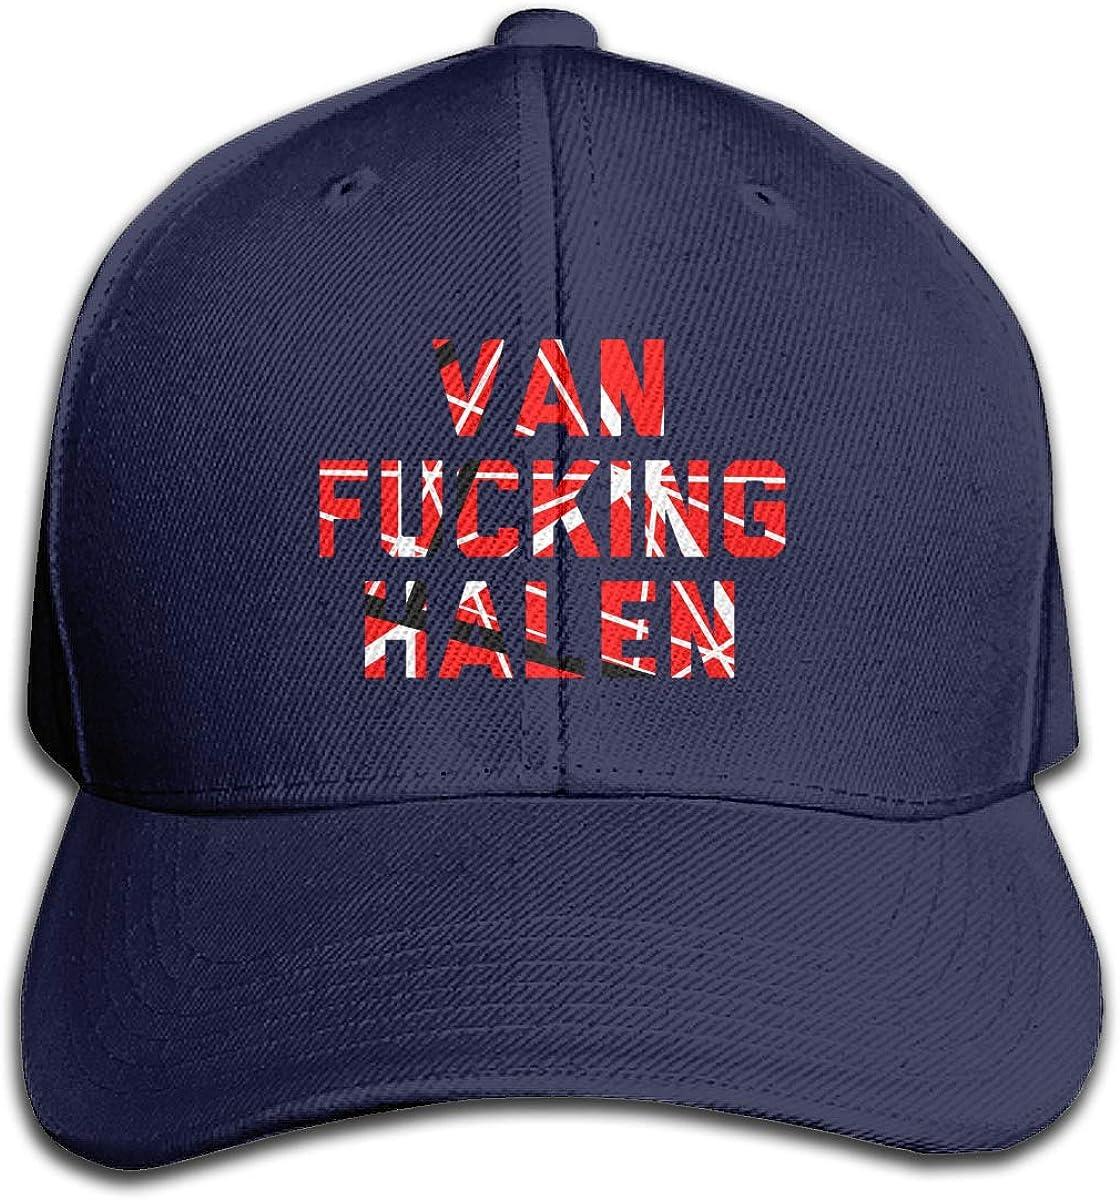 Van Fucking Halen VH Baseball Cap Graffiti Classic Novelty Black Dad Cap for Guys Unisex Adult